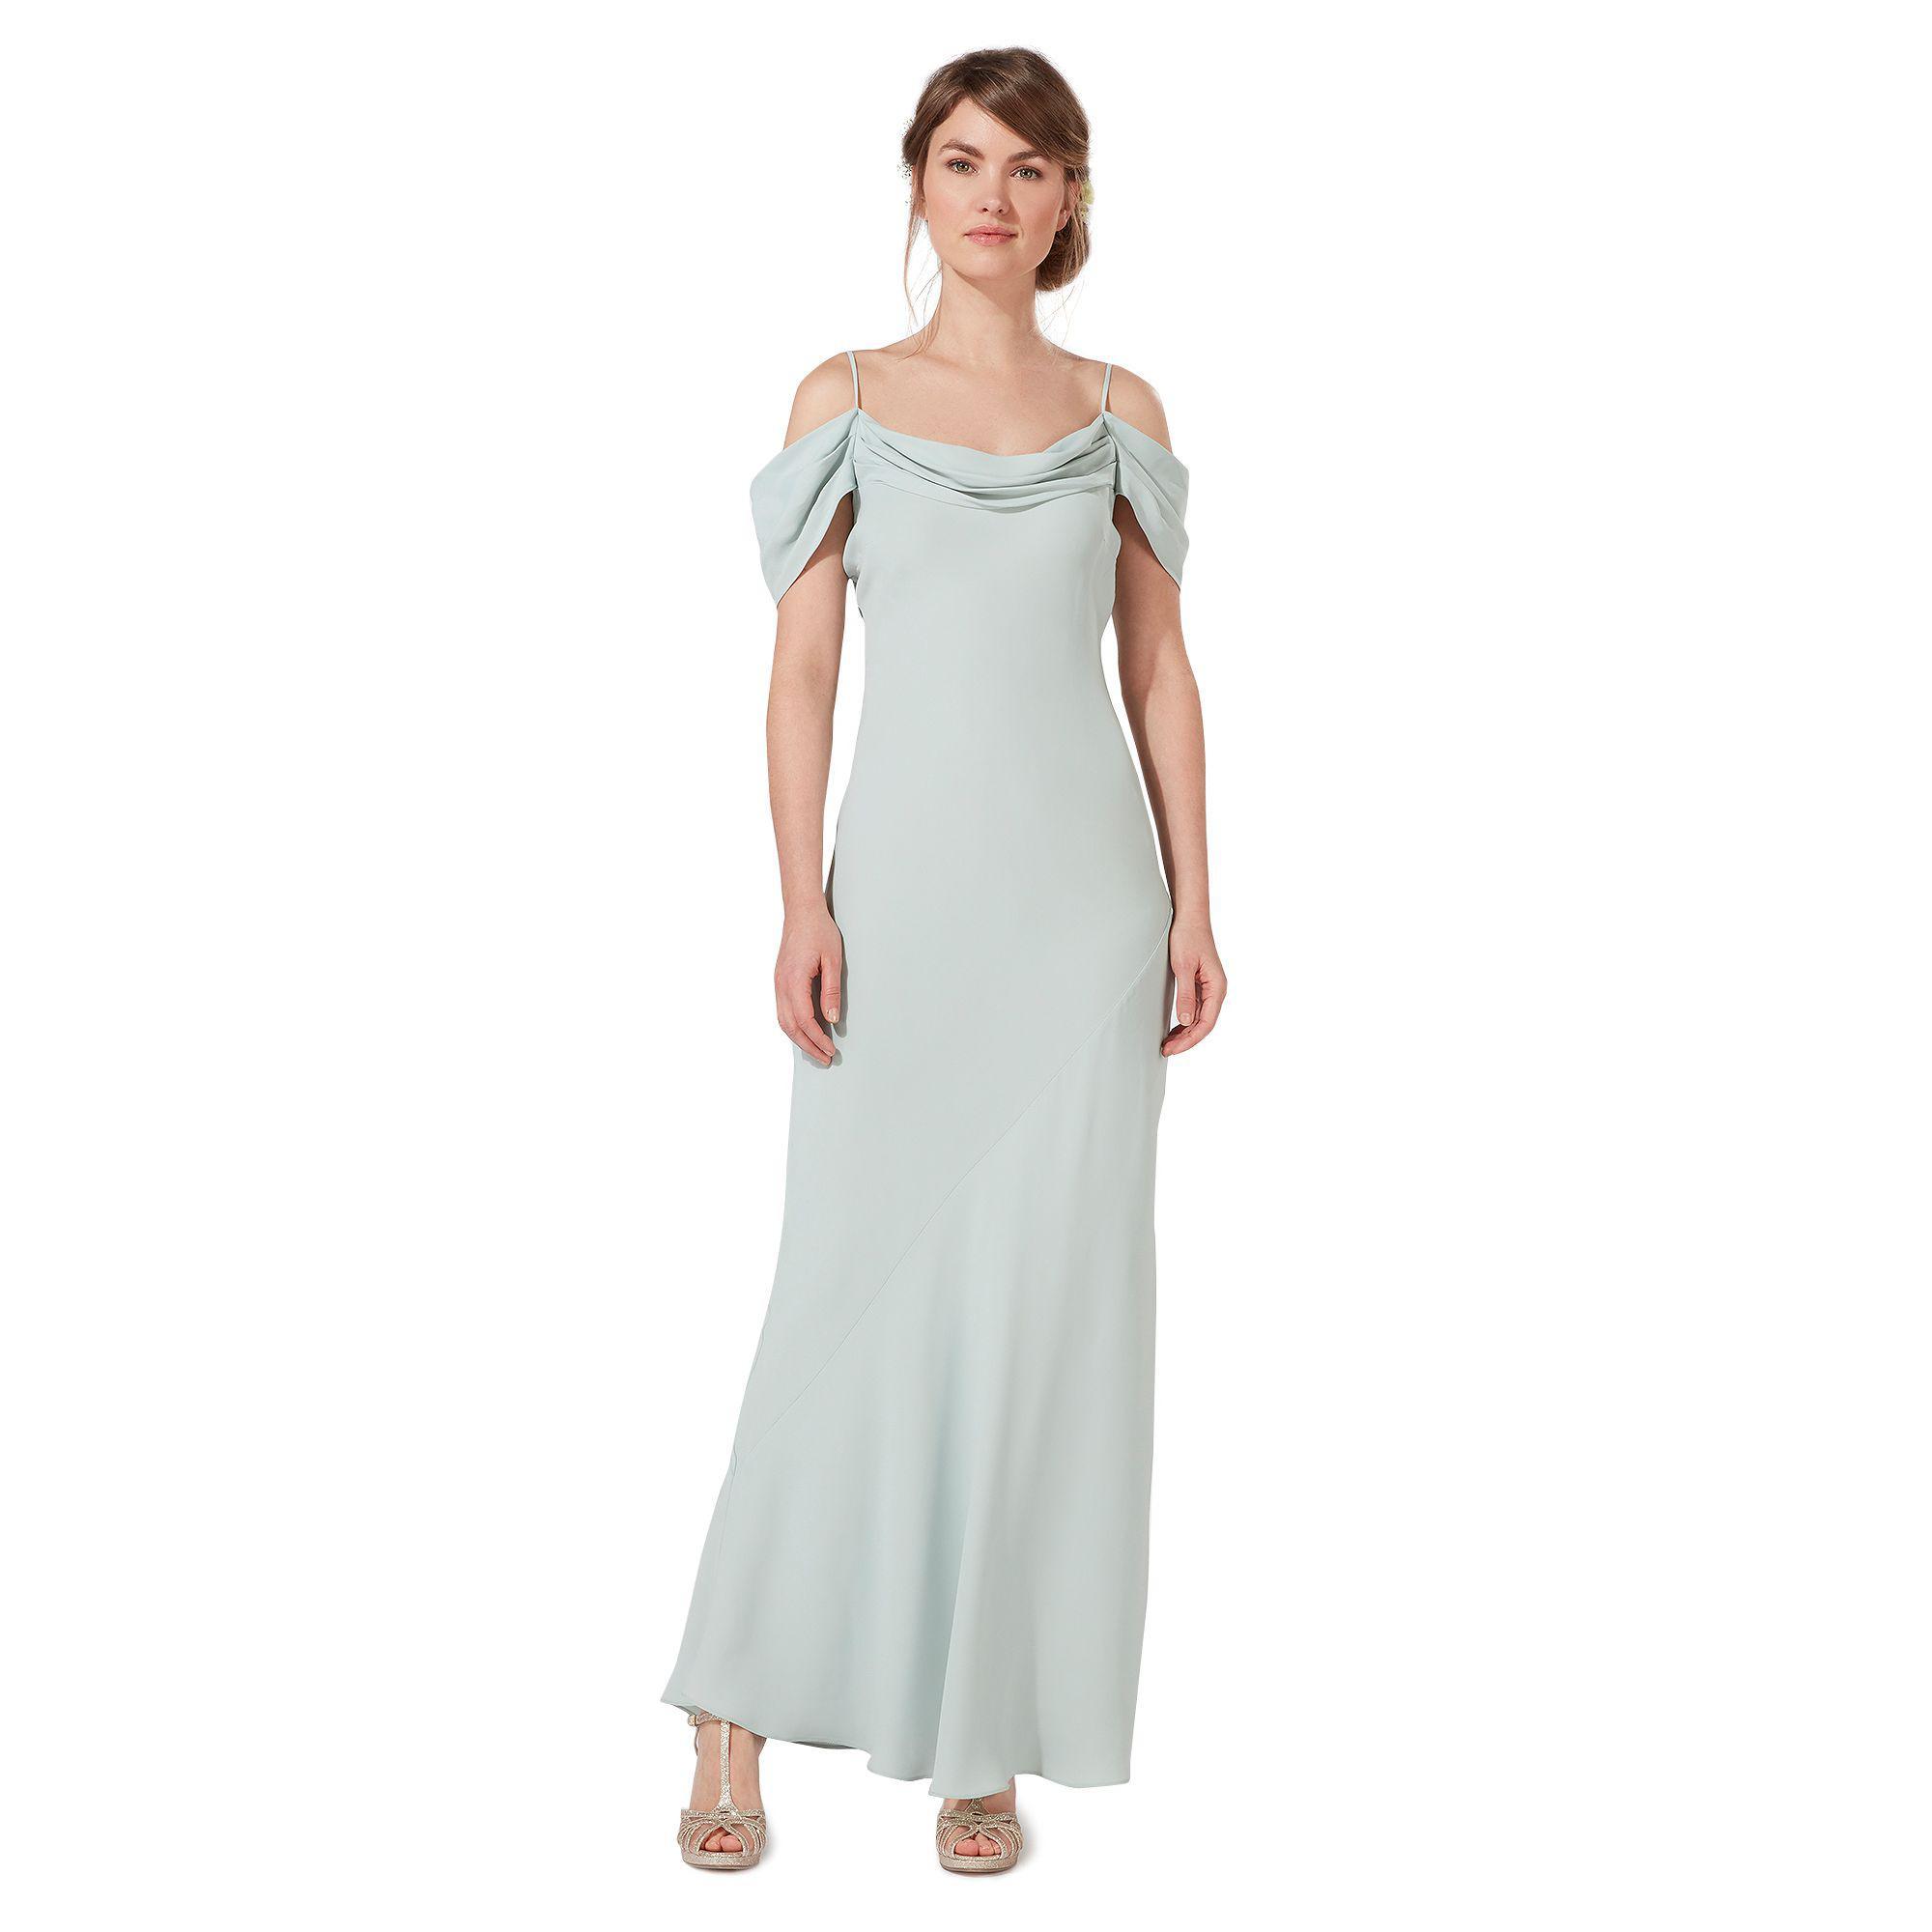 Début Green Felicity Cowl Neck Cold Shoulder Evening Dress In